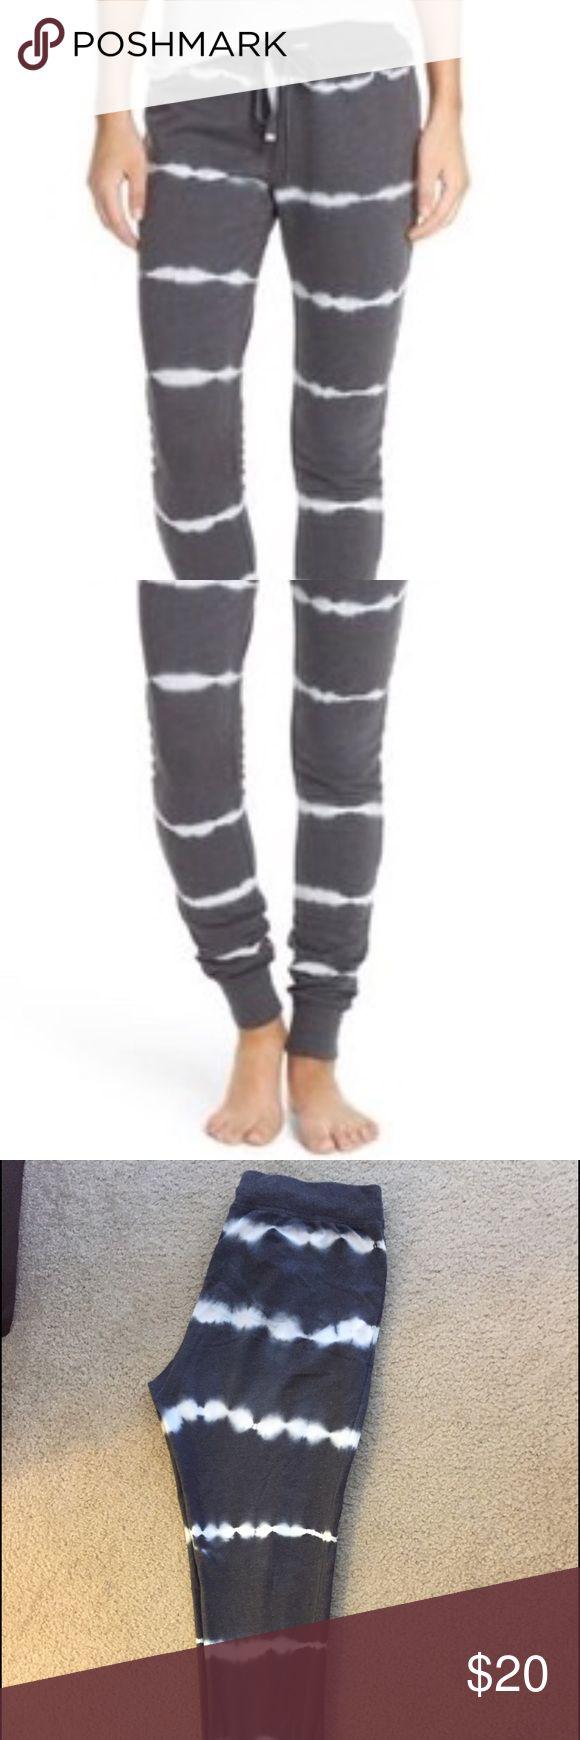 Make + Model fleece jogger lounge pants Make + Model fleece line jogger lounge pants. Never worn. Snug fit. Tie die stripe pattern. Purchased at Nordstrom. NWOT. Make + Model Intimates & Sleepwear